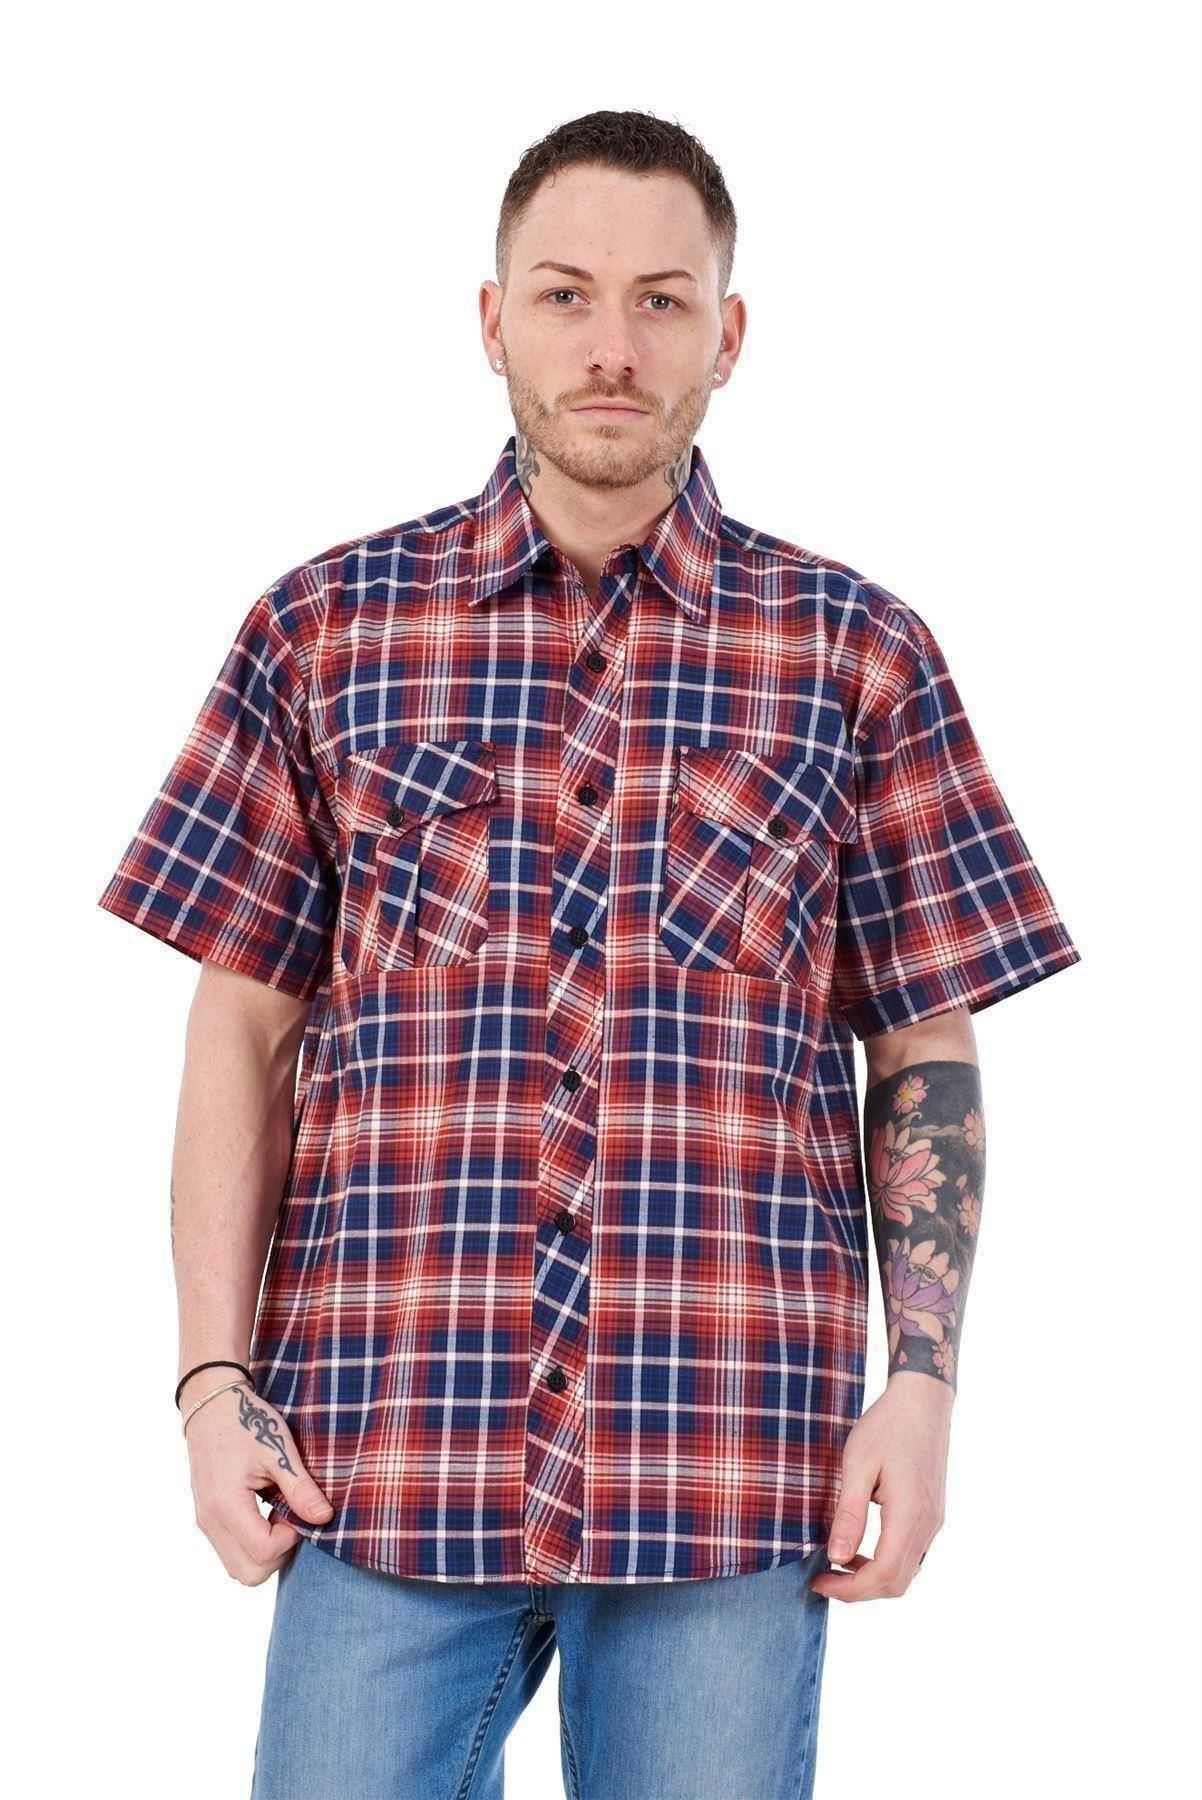 Mens-Regular-Big-Size-Shirts-Checked-Cotton-Blend-Casual-Short-Sleeve-Blue-M-5XL thumbnail 28